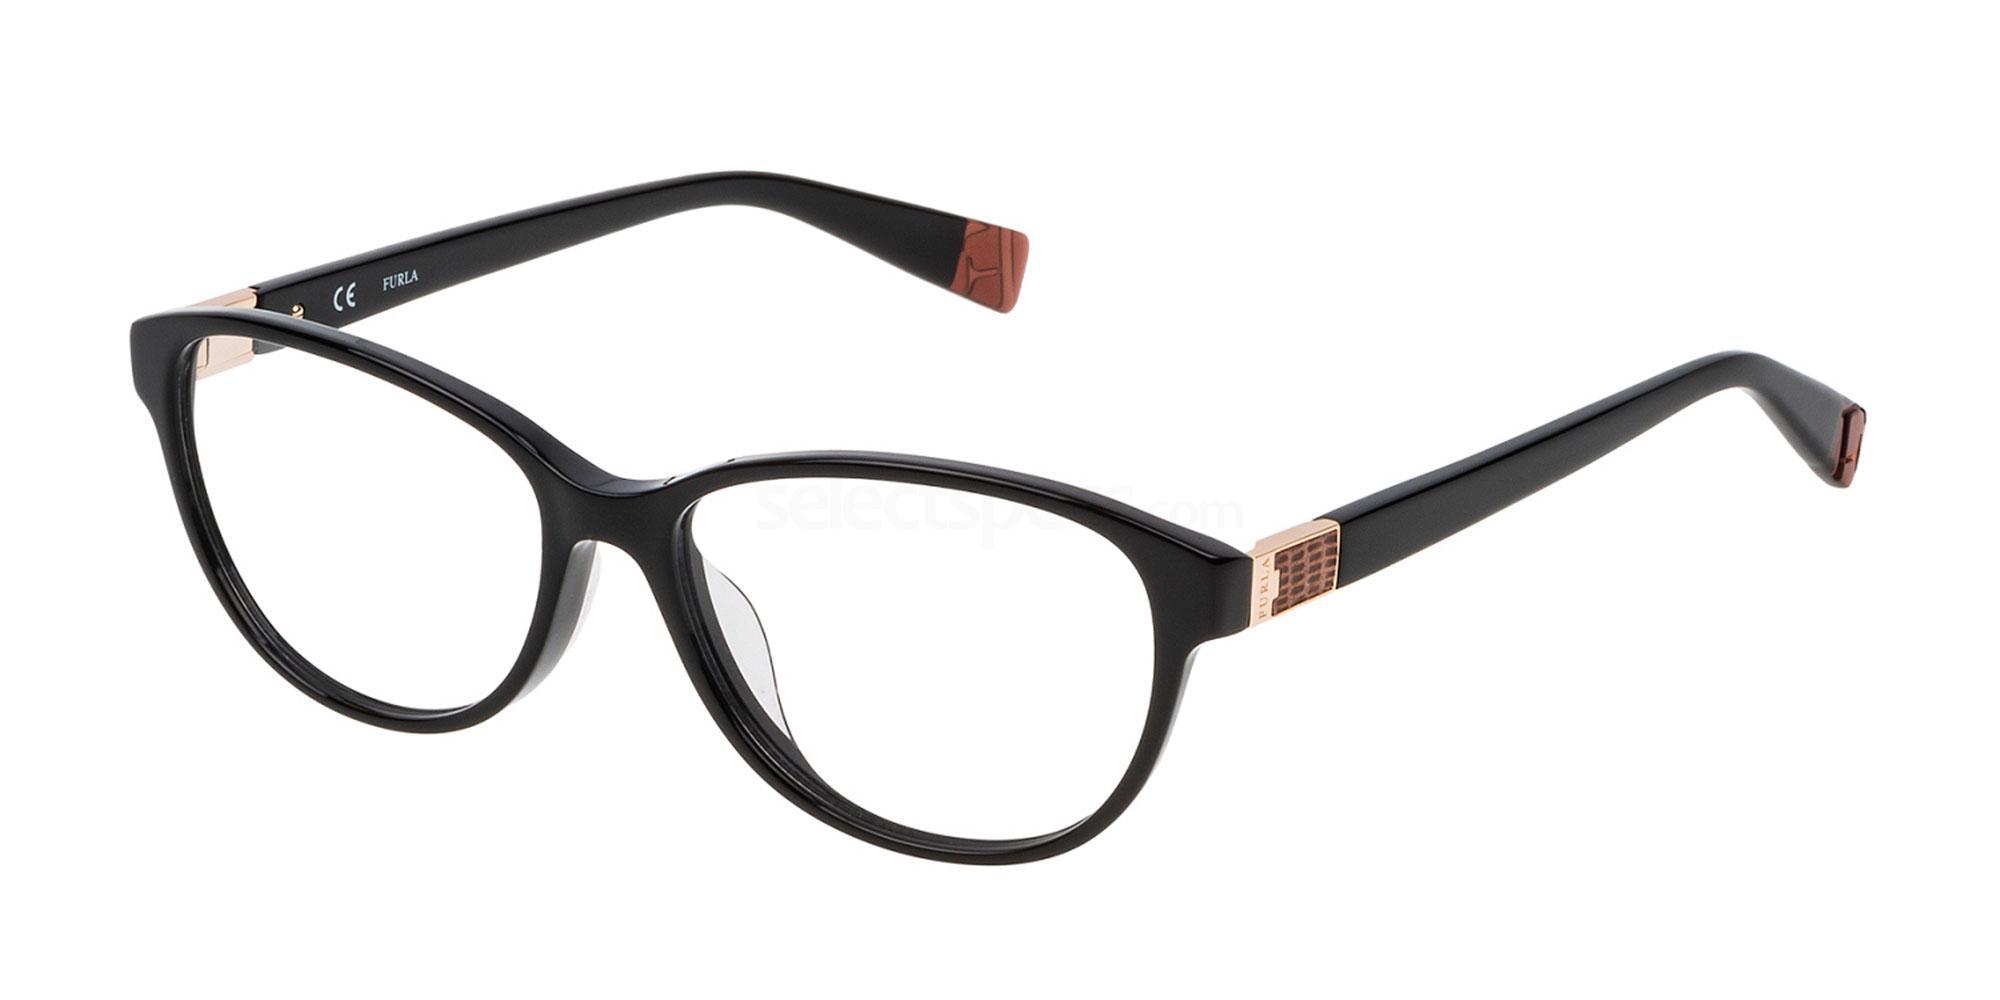 0700 VFU030 Glasses, Furla